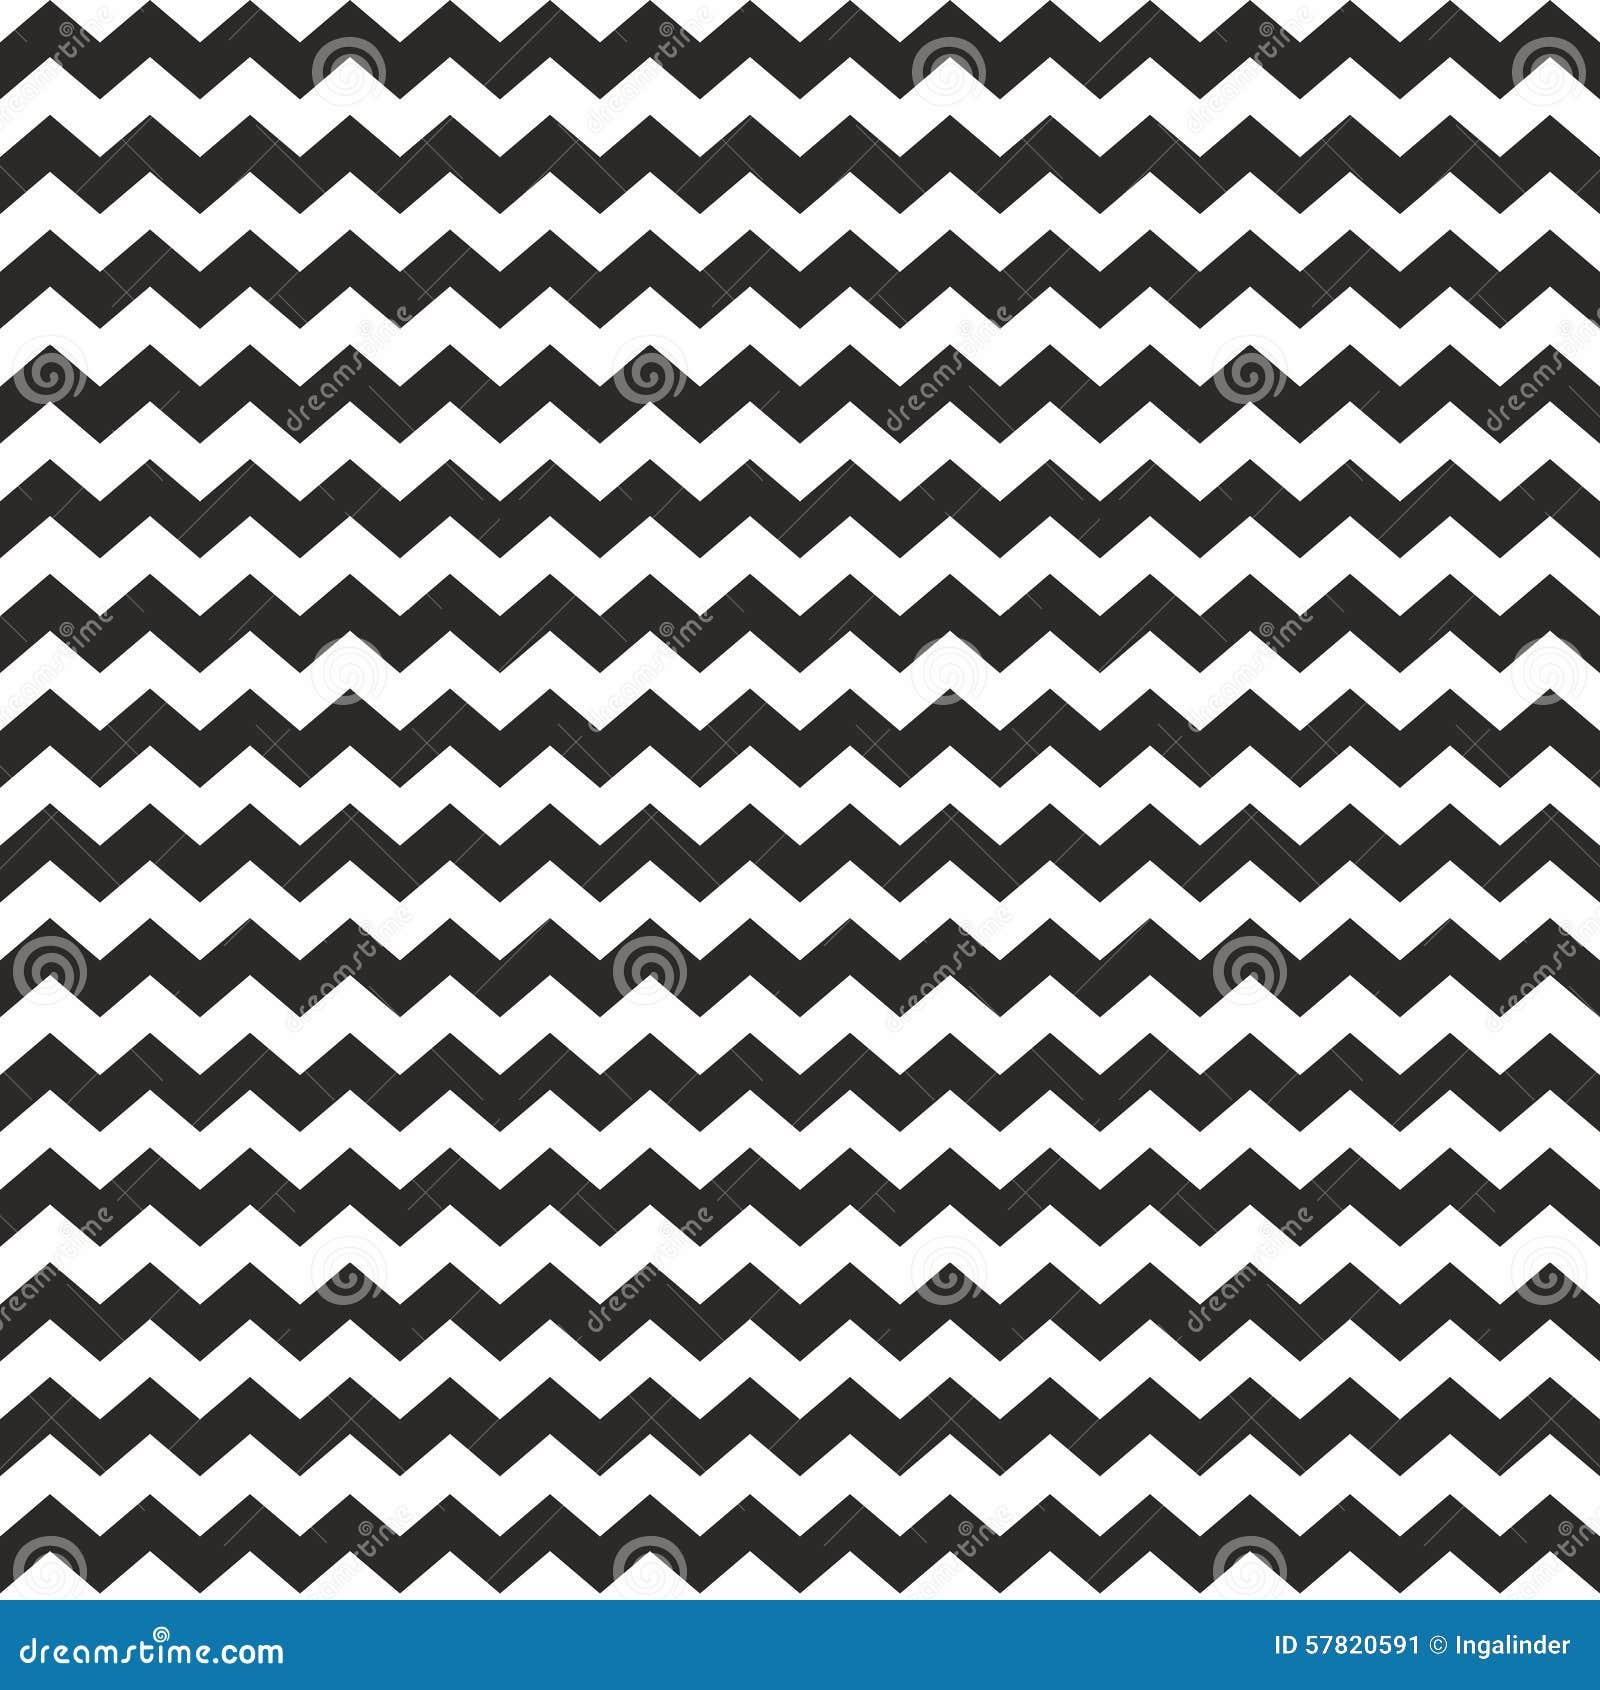 Zig Zag Vector Chevron Black And White Tile Pattern Stock